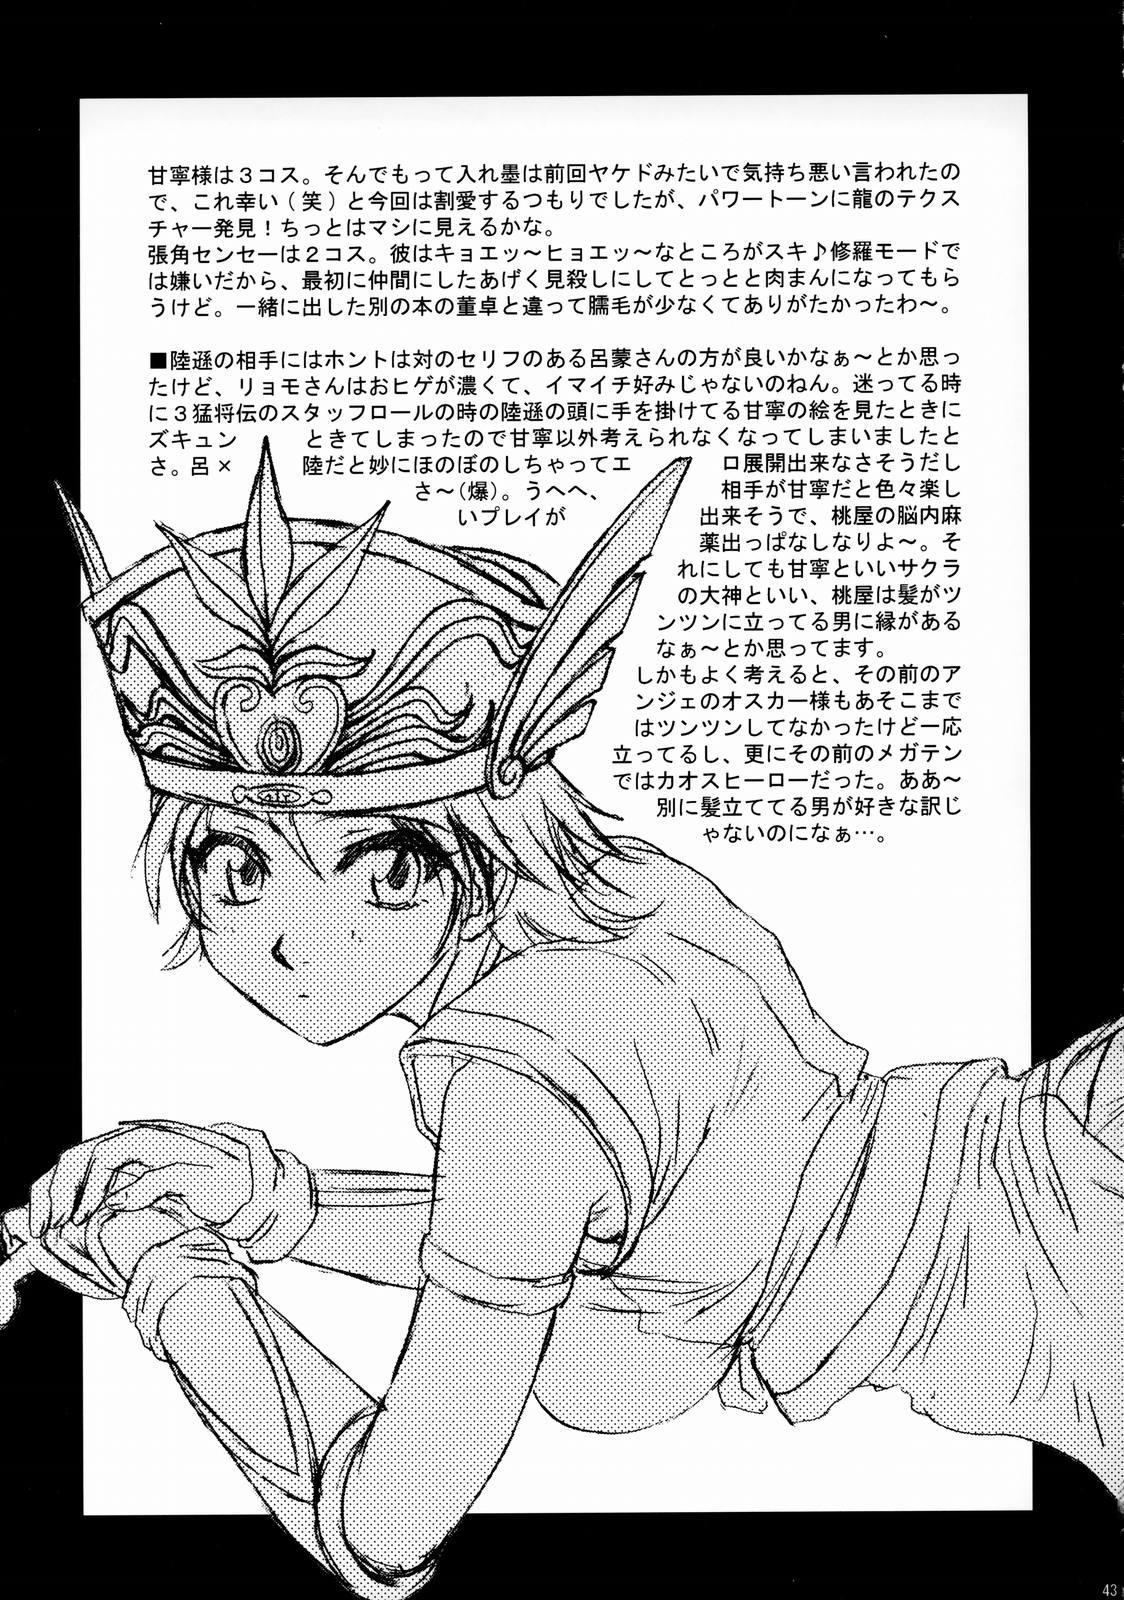 In Sangoku Musou Rikuson Gaiden 41